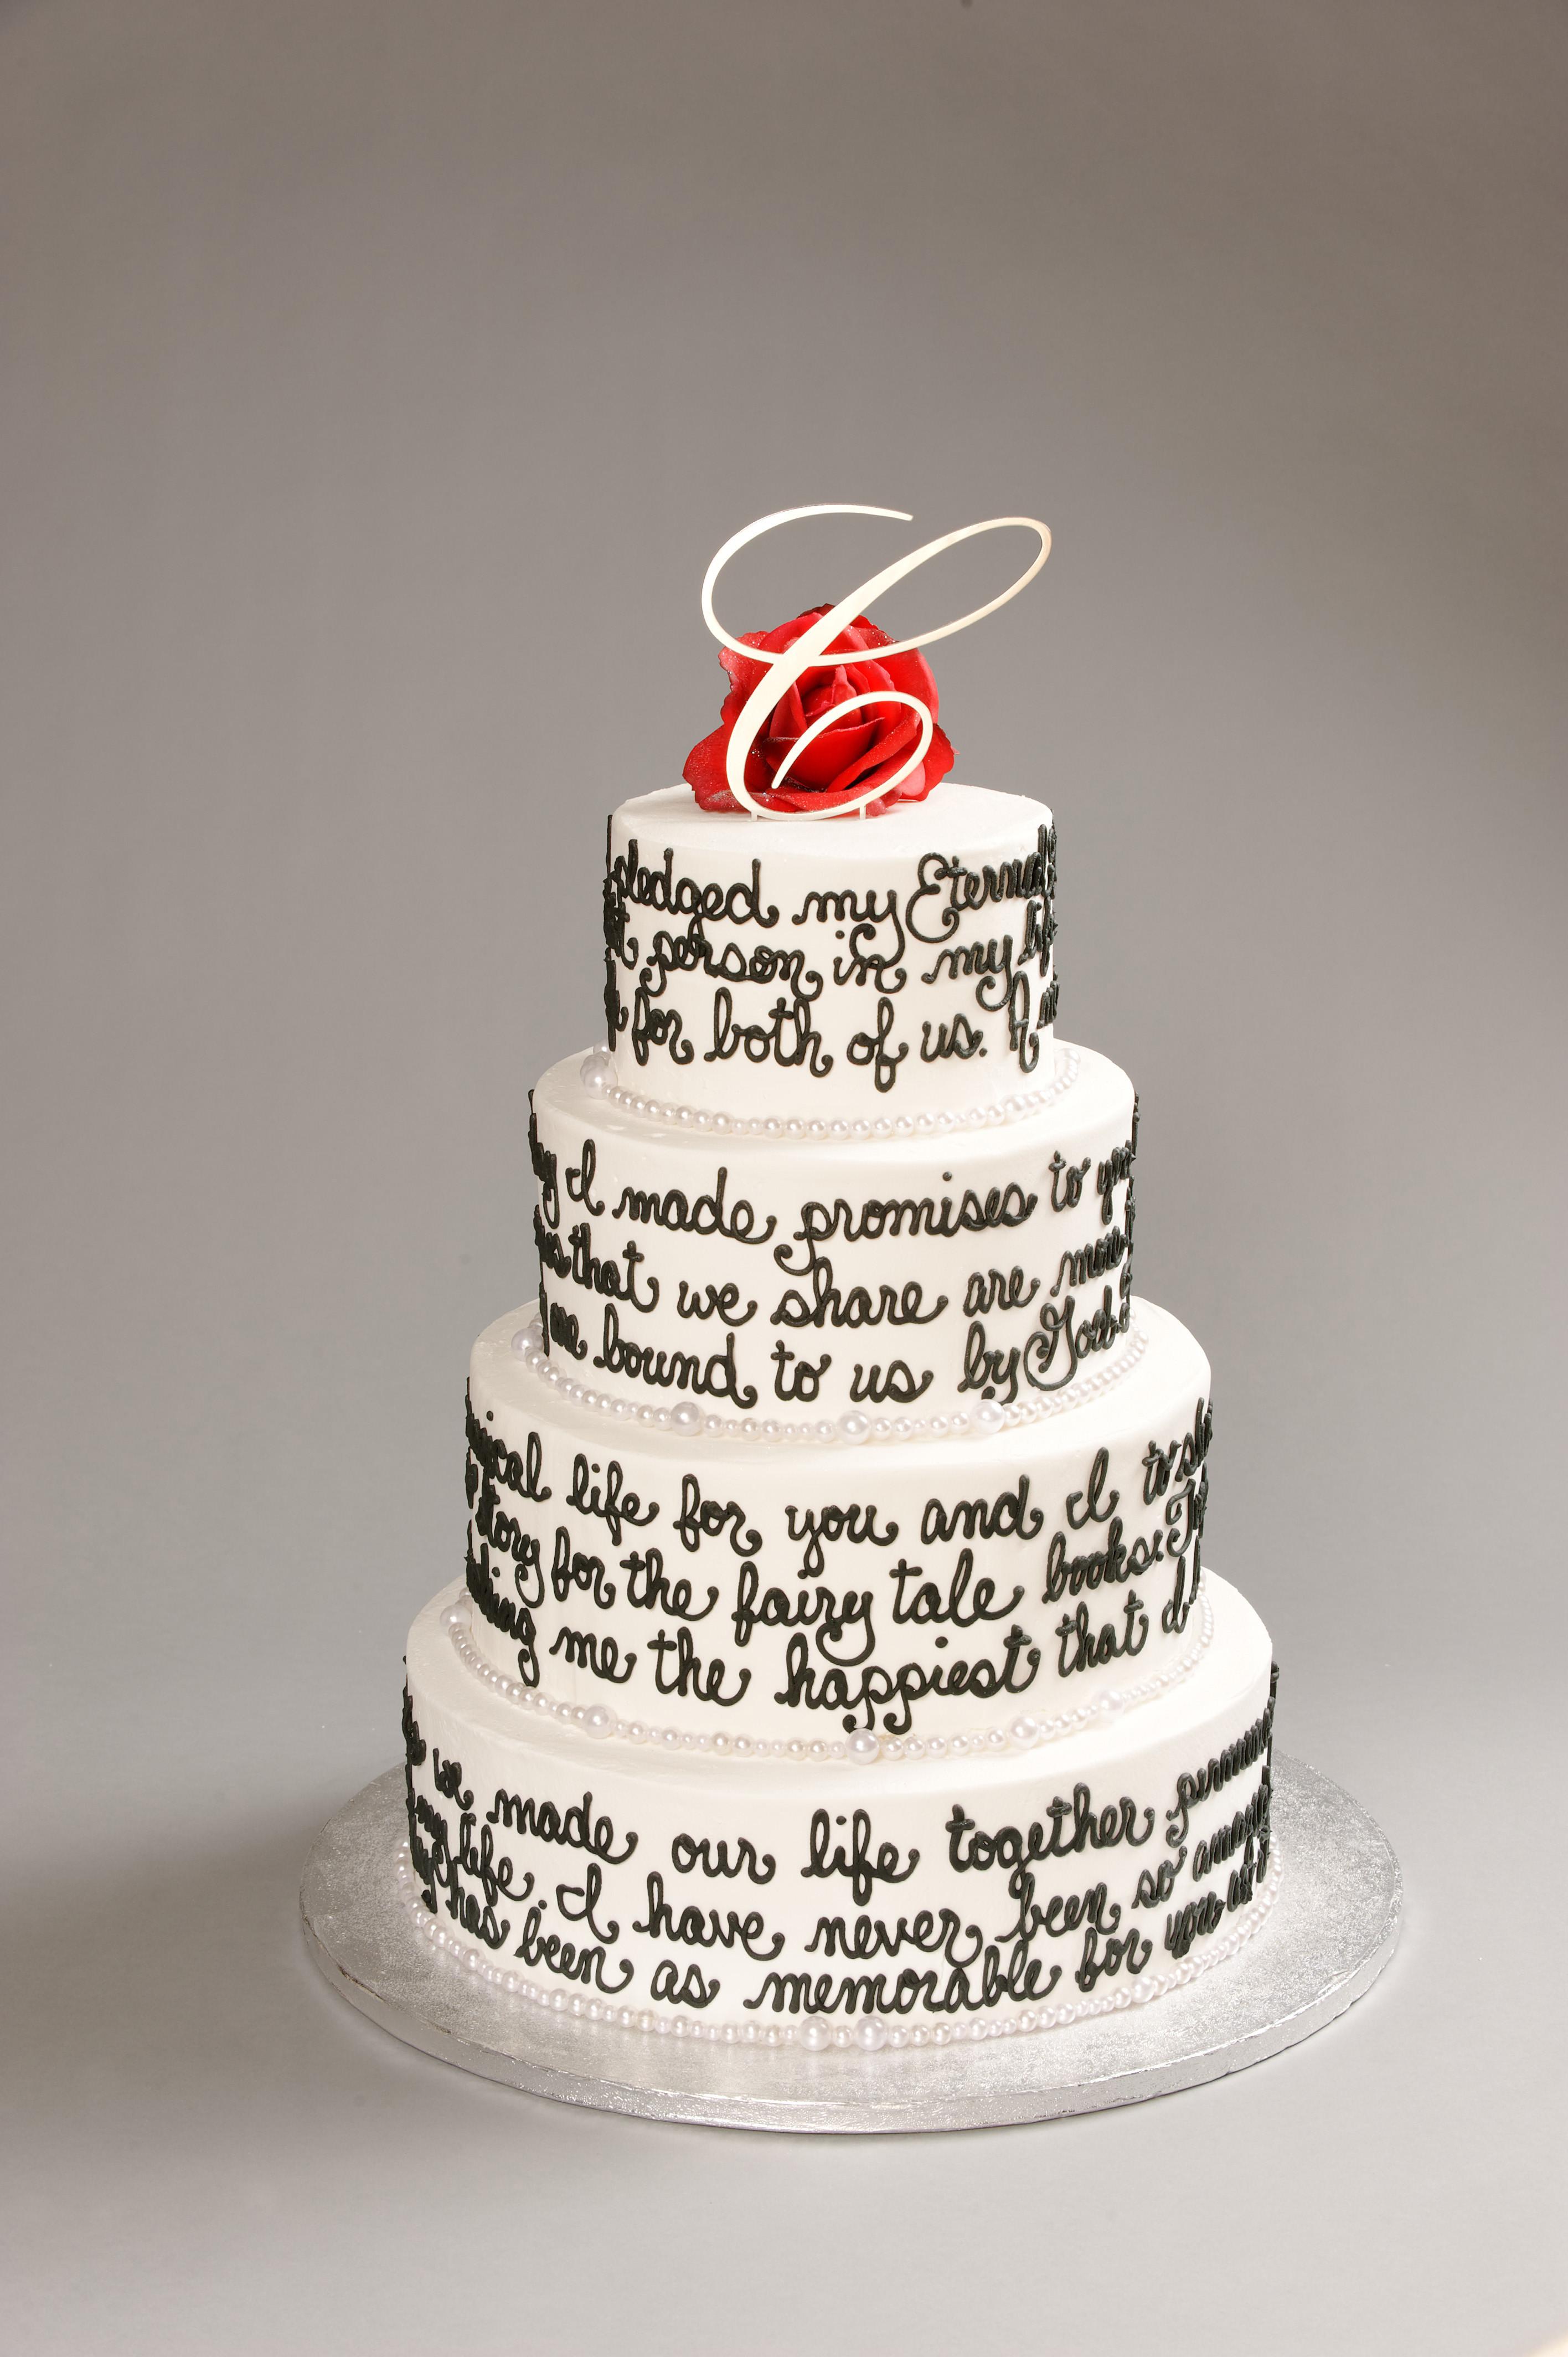 Wedding Cakes Pictures And Prices  Pricing & Sizes Wichita Wedding Cakes Birthday Cakes